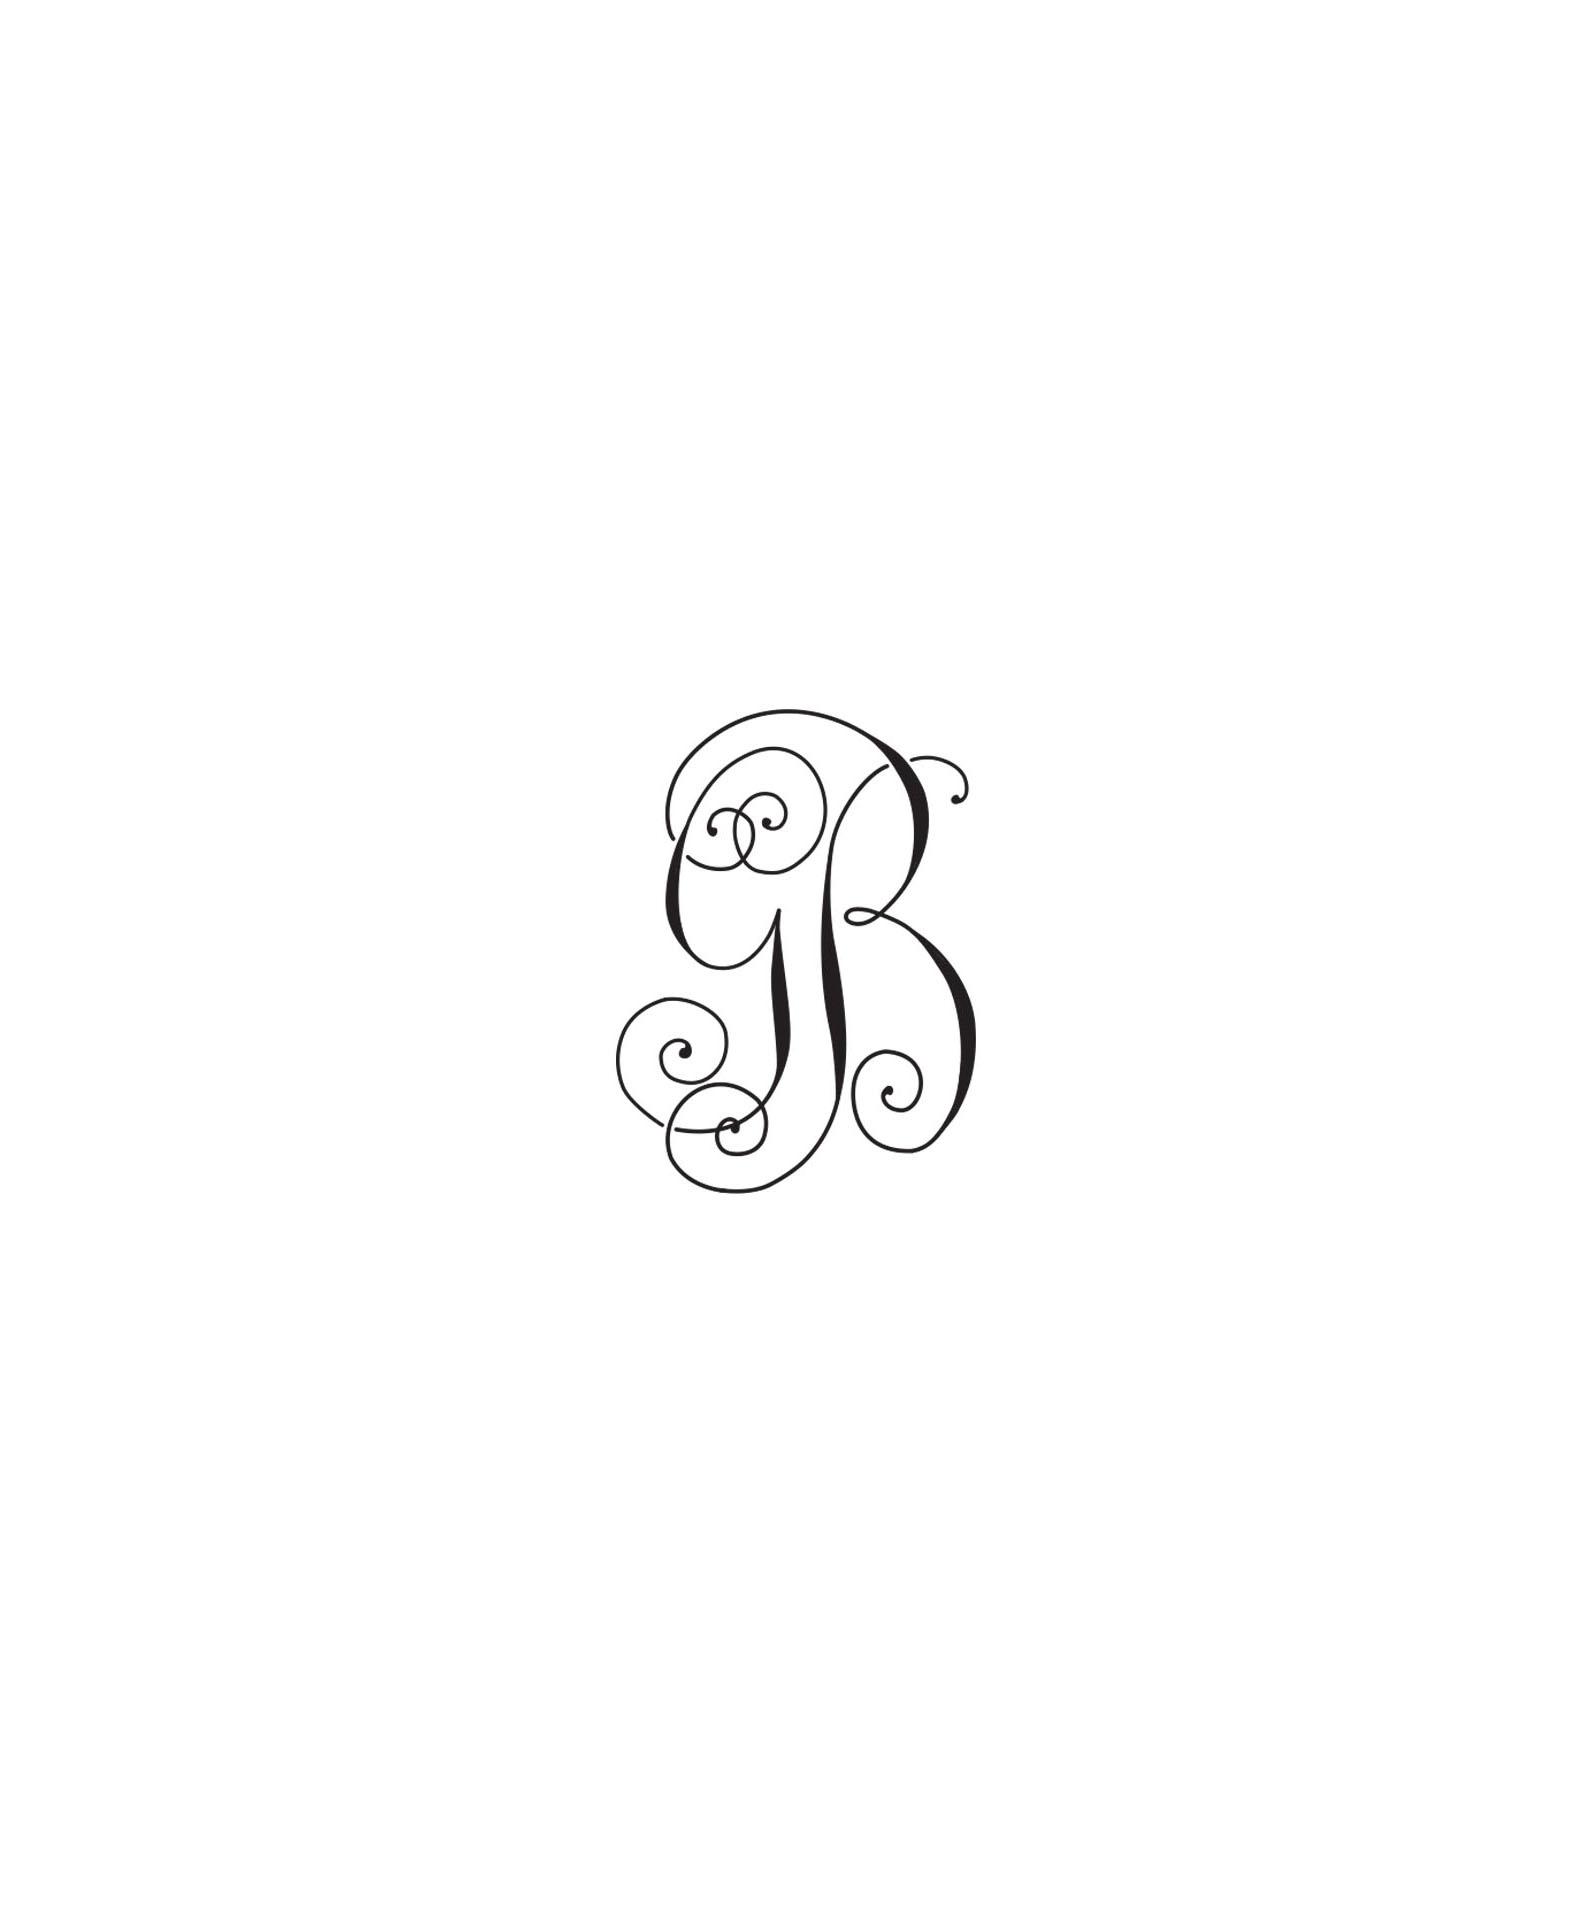 gb monogram for MSW.jpg